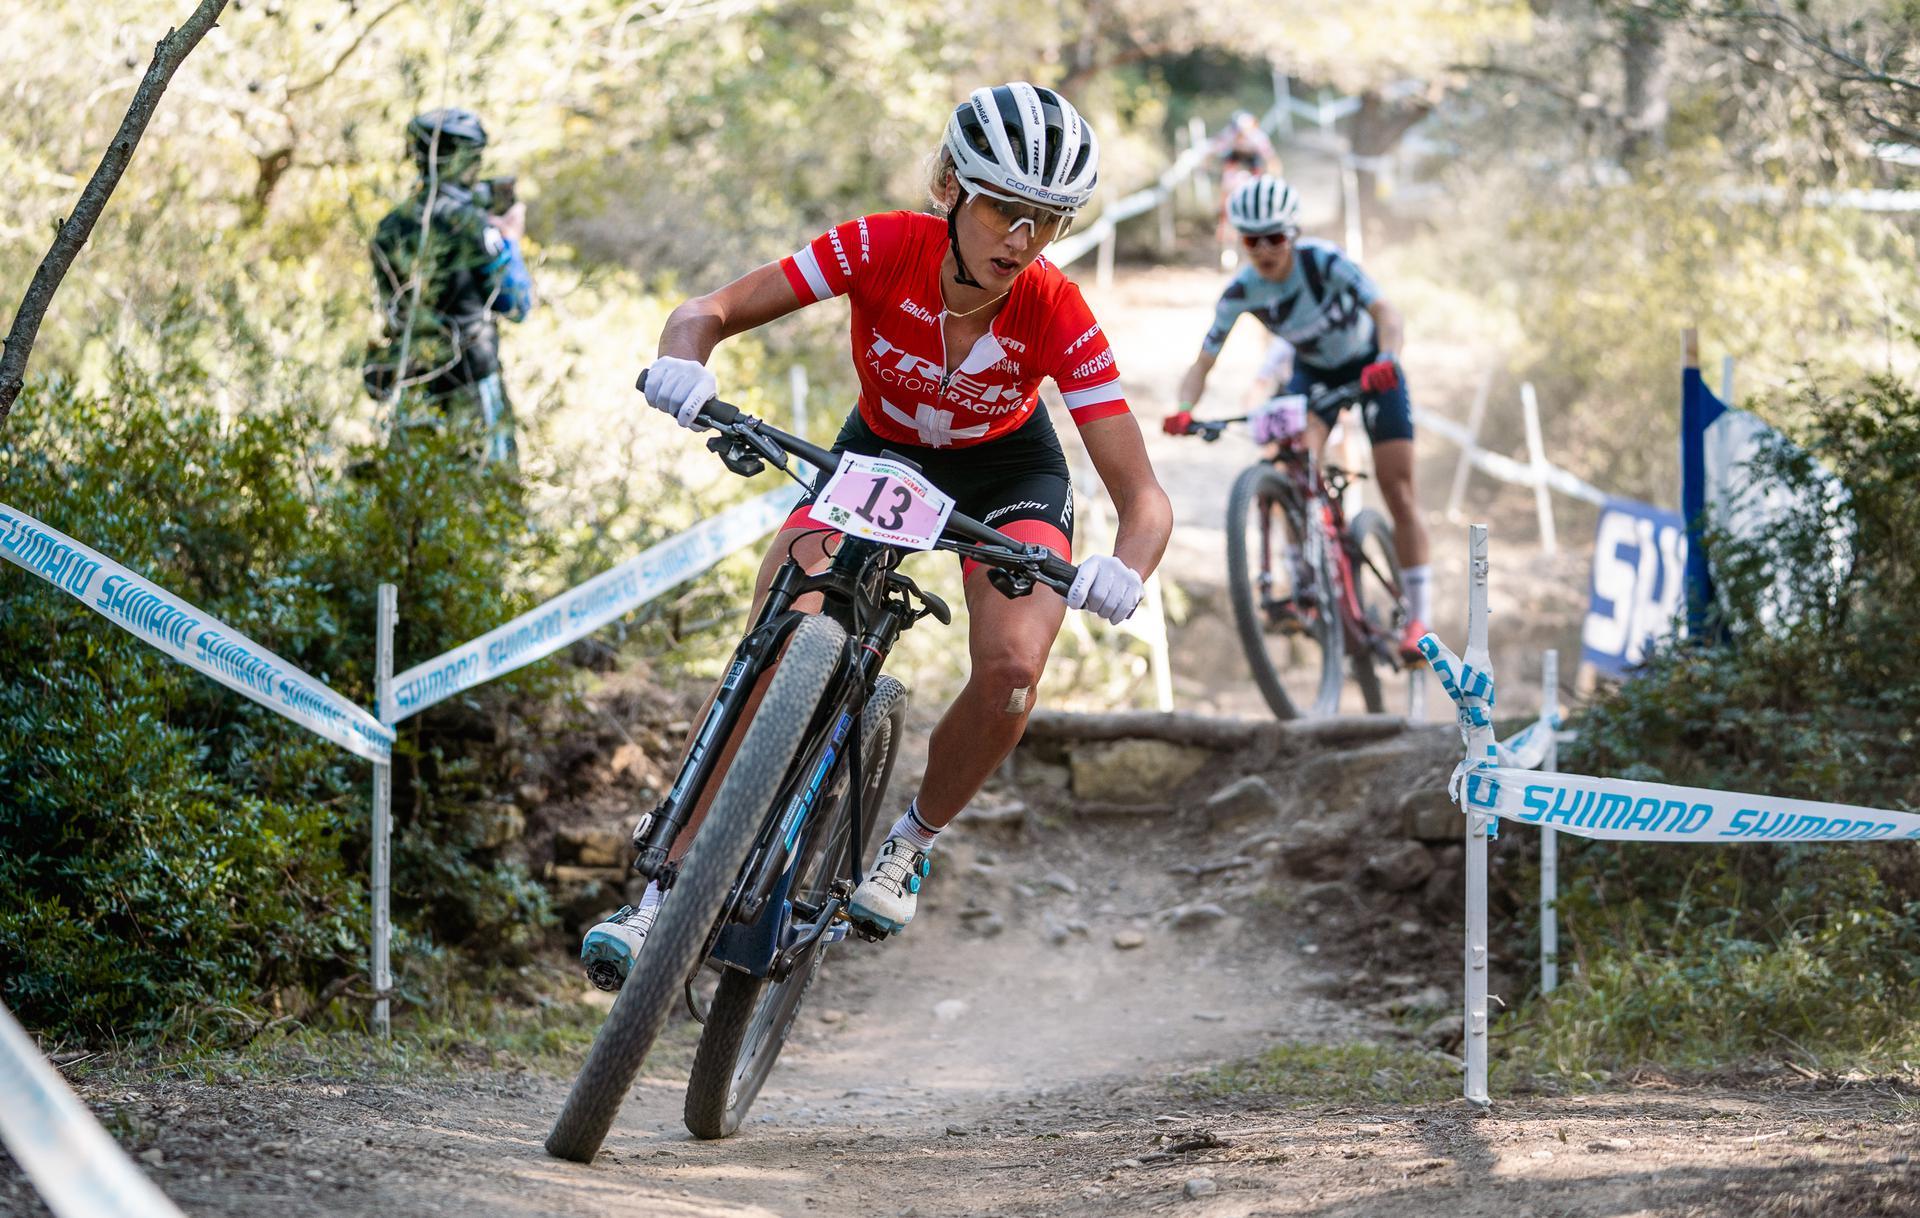 Andora Race Cup